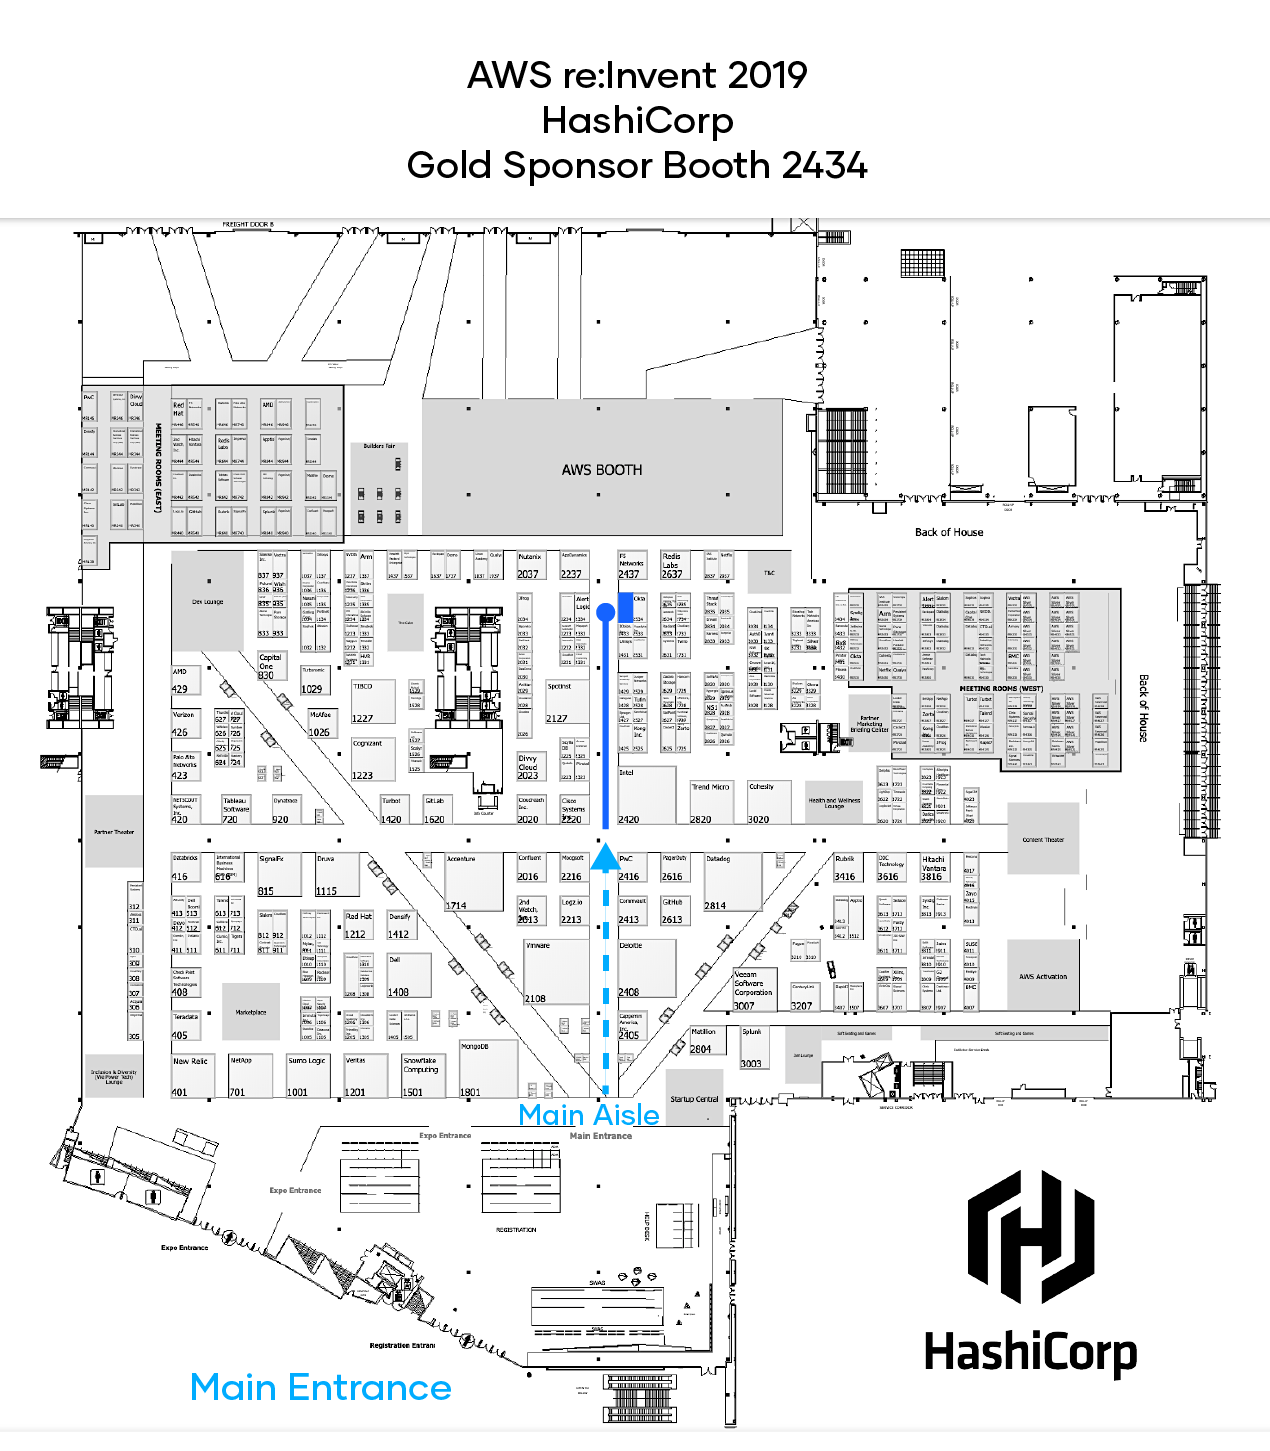 re:Invent expo floor map